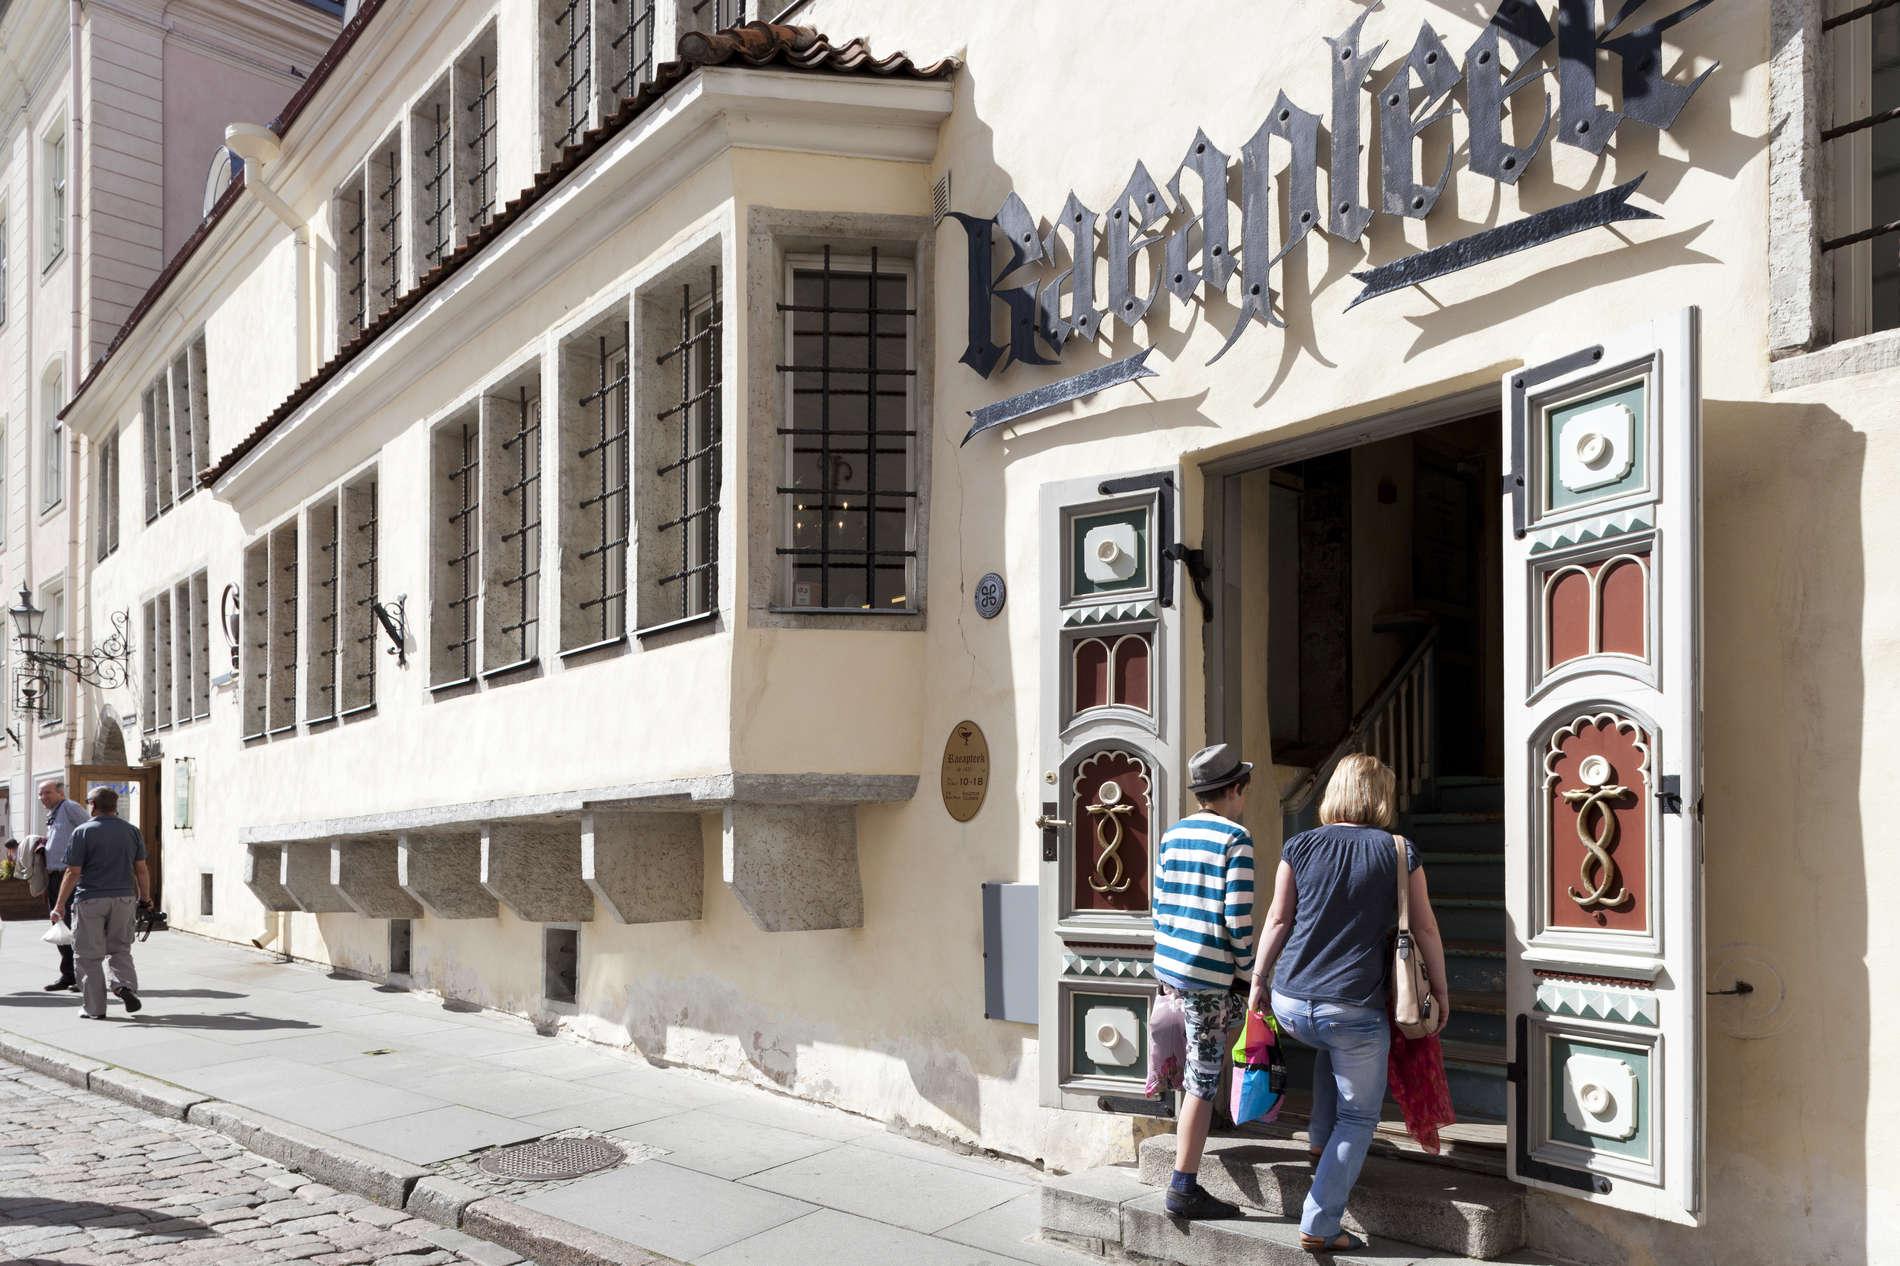 Town Hall Pharmacy in Tallinn, Estonia